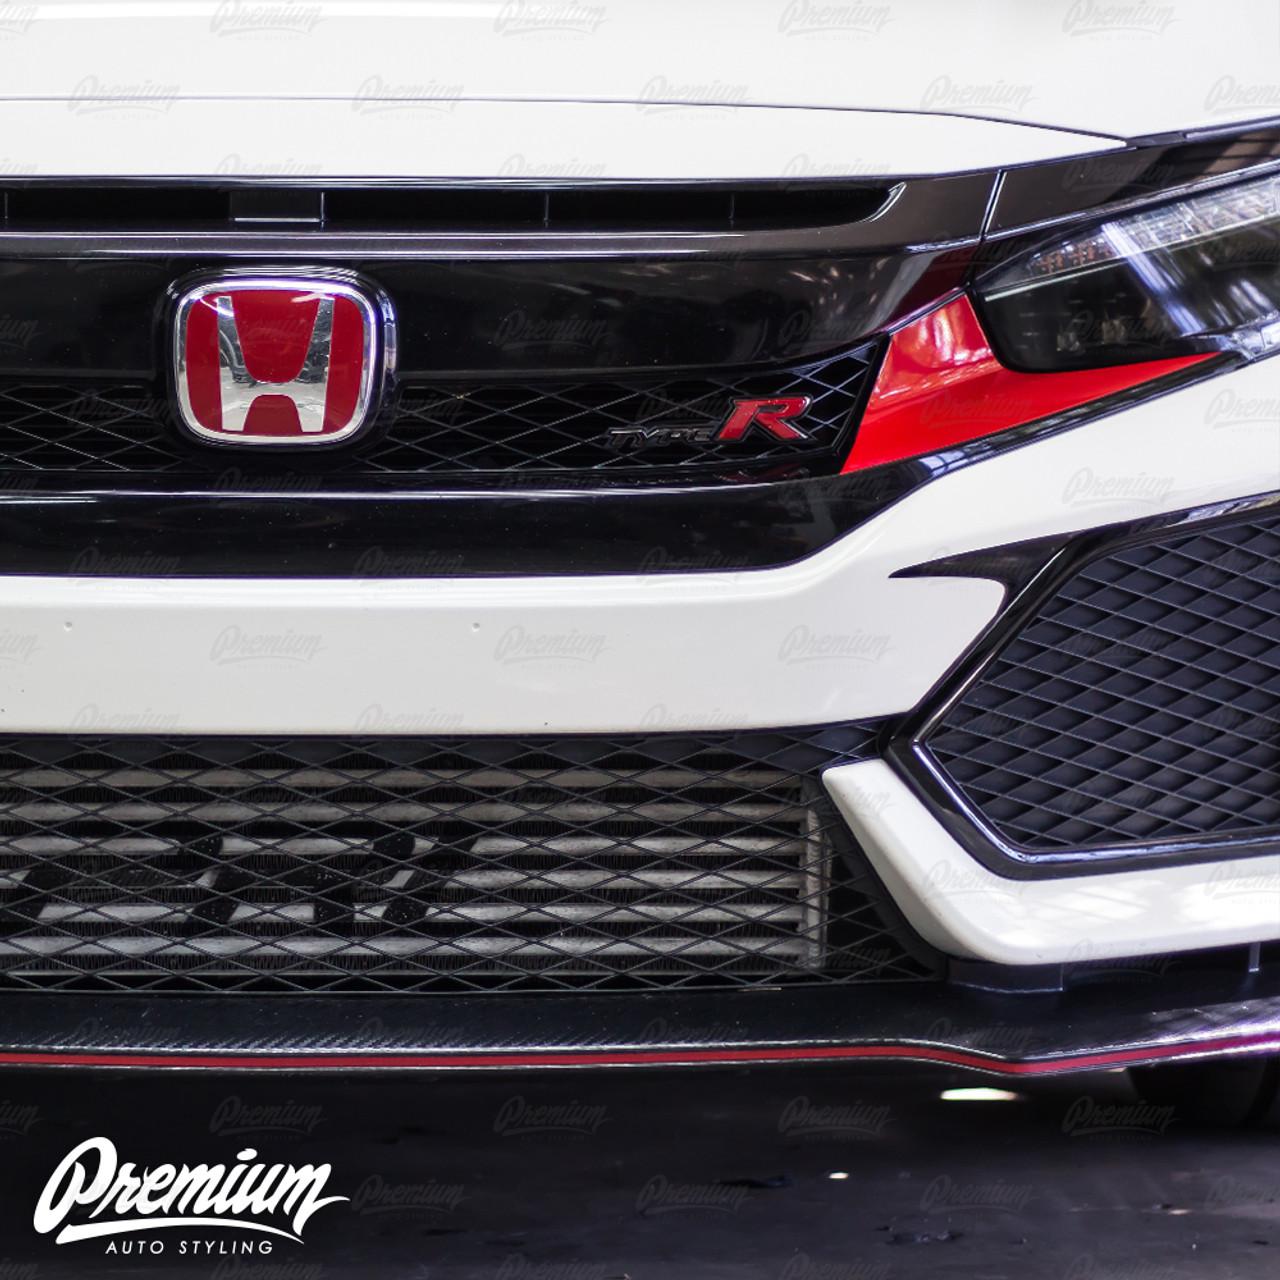 Front Bumper Accent Vinyl Overlay - Gloss Black | 2016-2018 Honda Civic  Type R